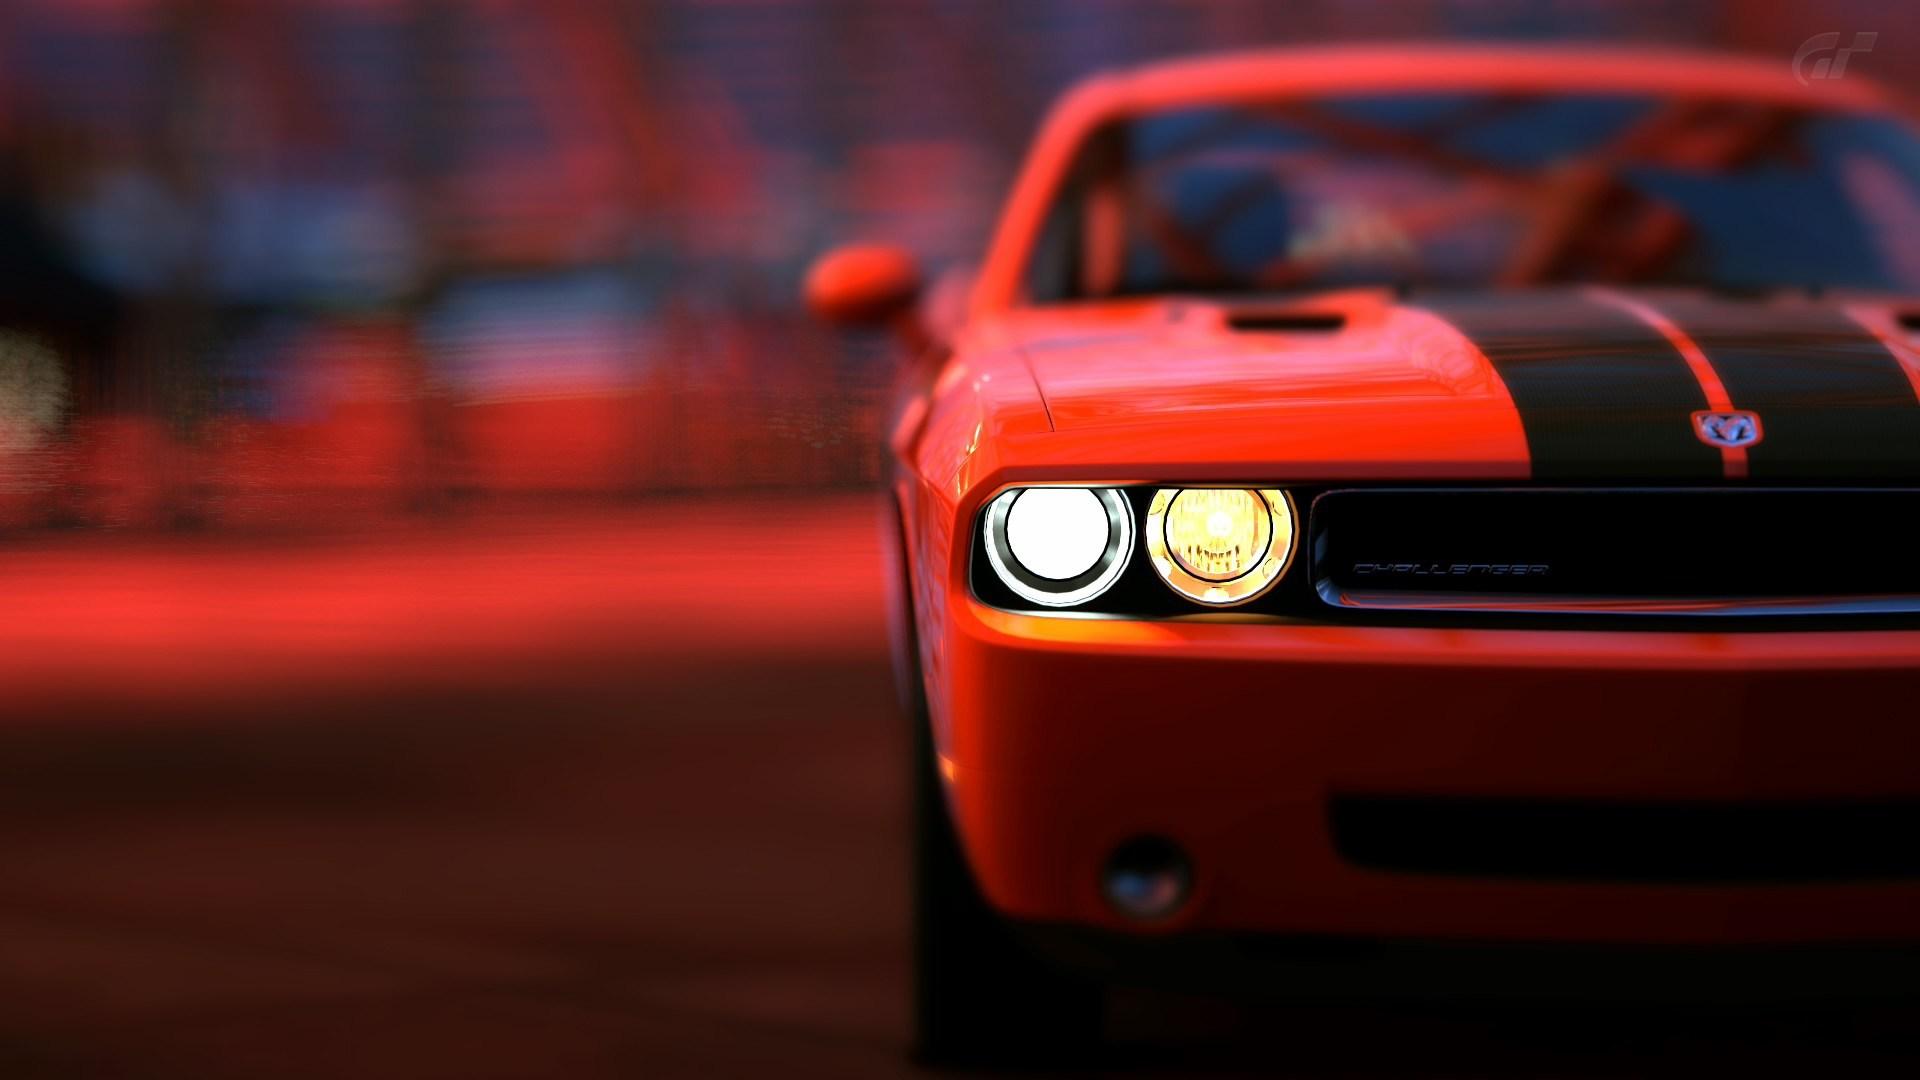 Download Dodge Challenger Wallpaper 23679 1920x1080 Px